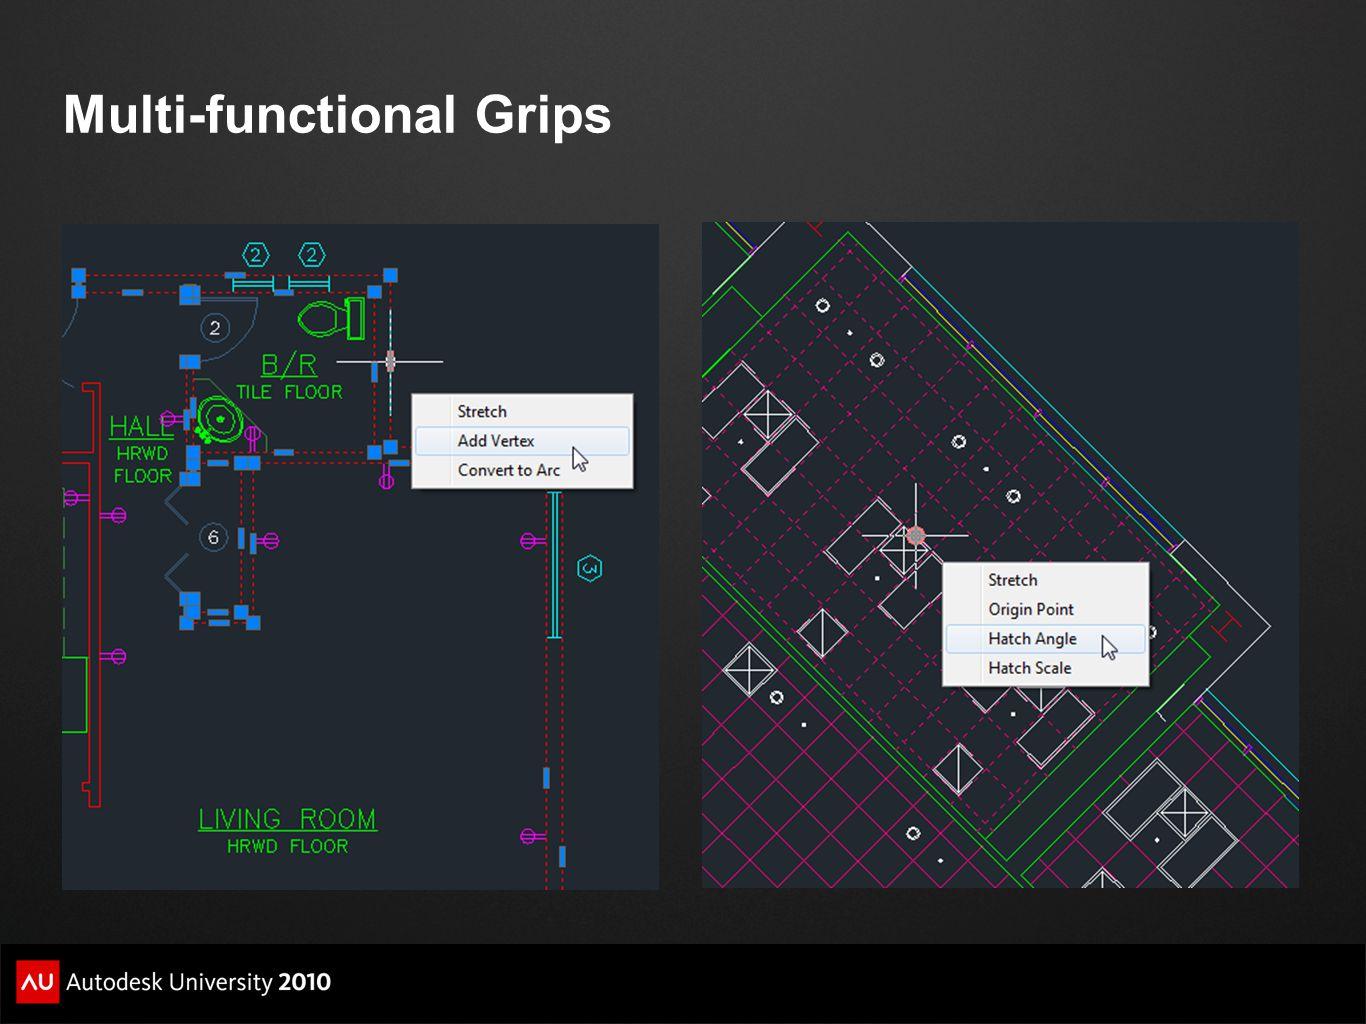 Multi-functional Grips